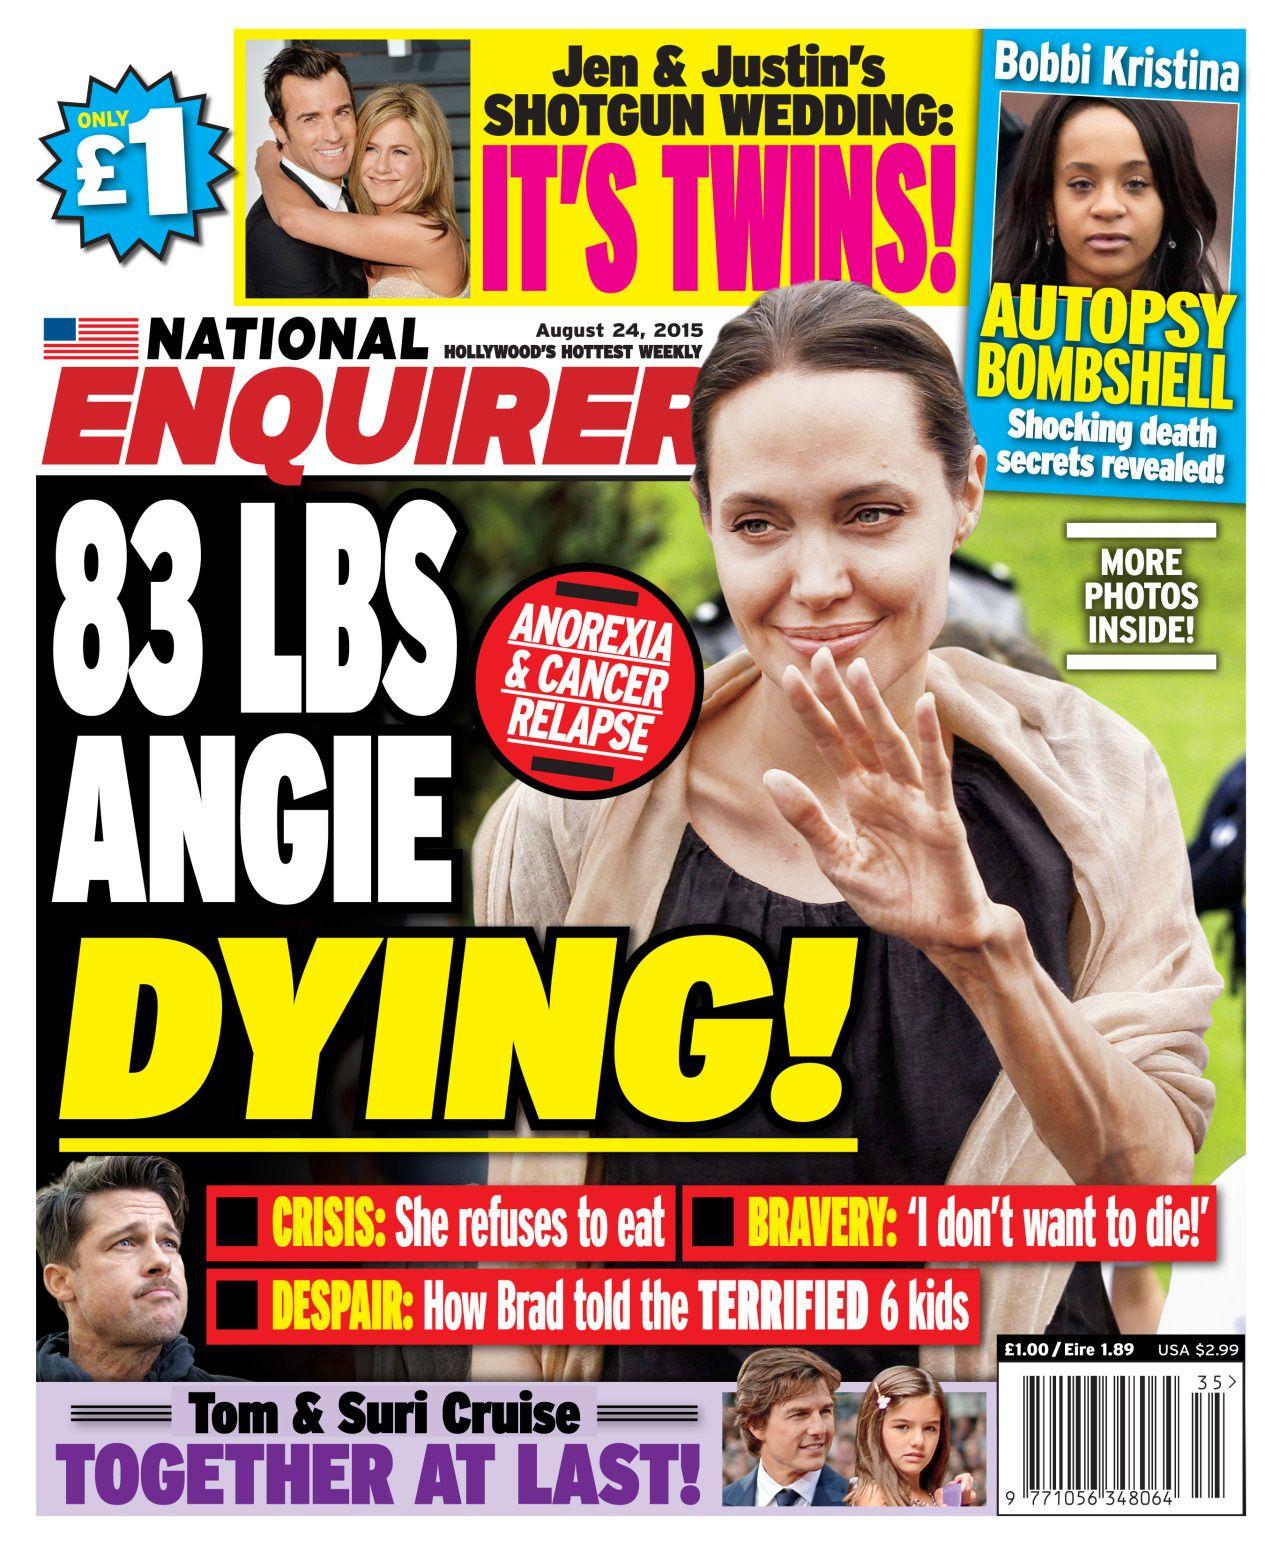 El tabloide sensacionalista The National Enquirer asegura que Angelina Jolie está gravemente enferma.